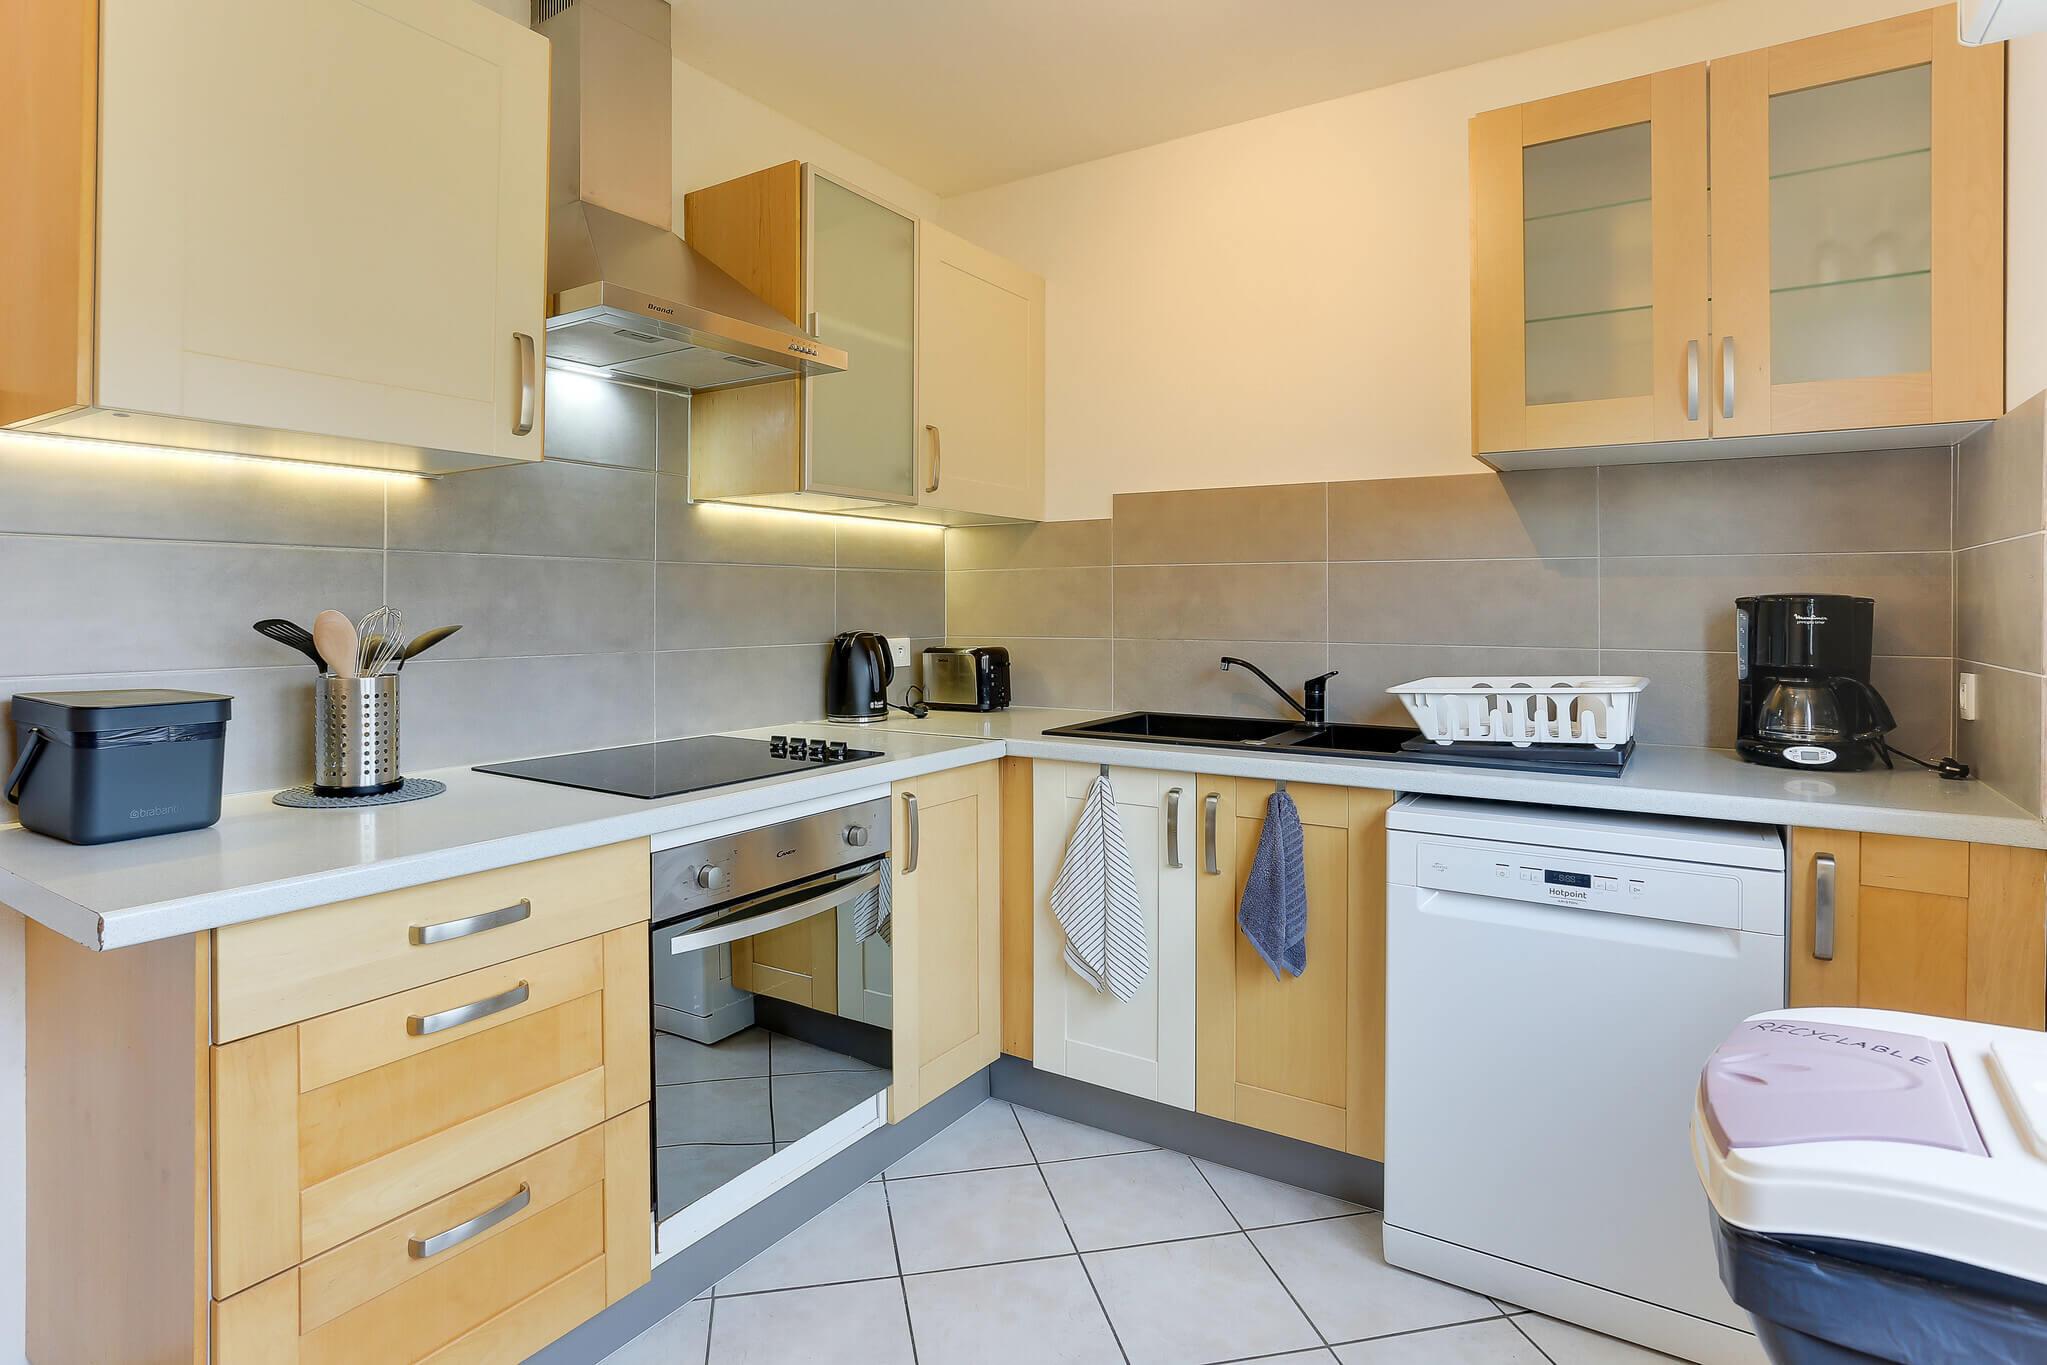 location-colocation-appartement-rennes-cuisine